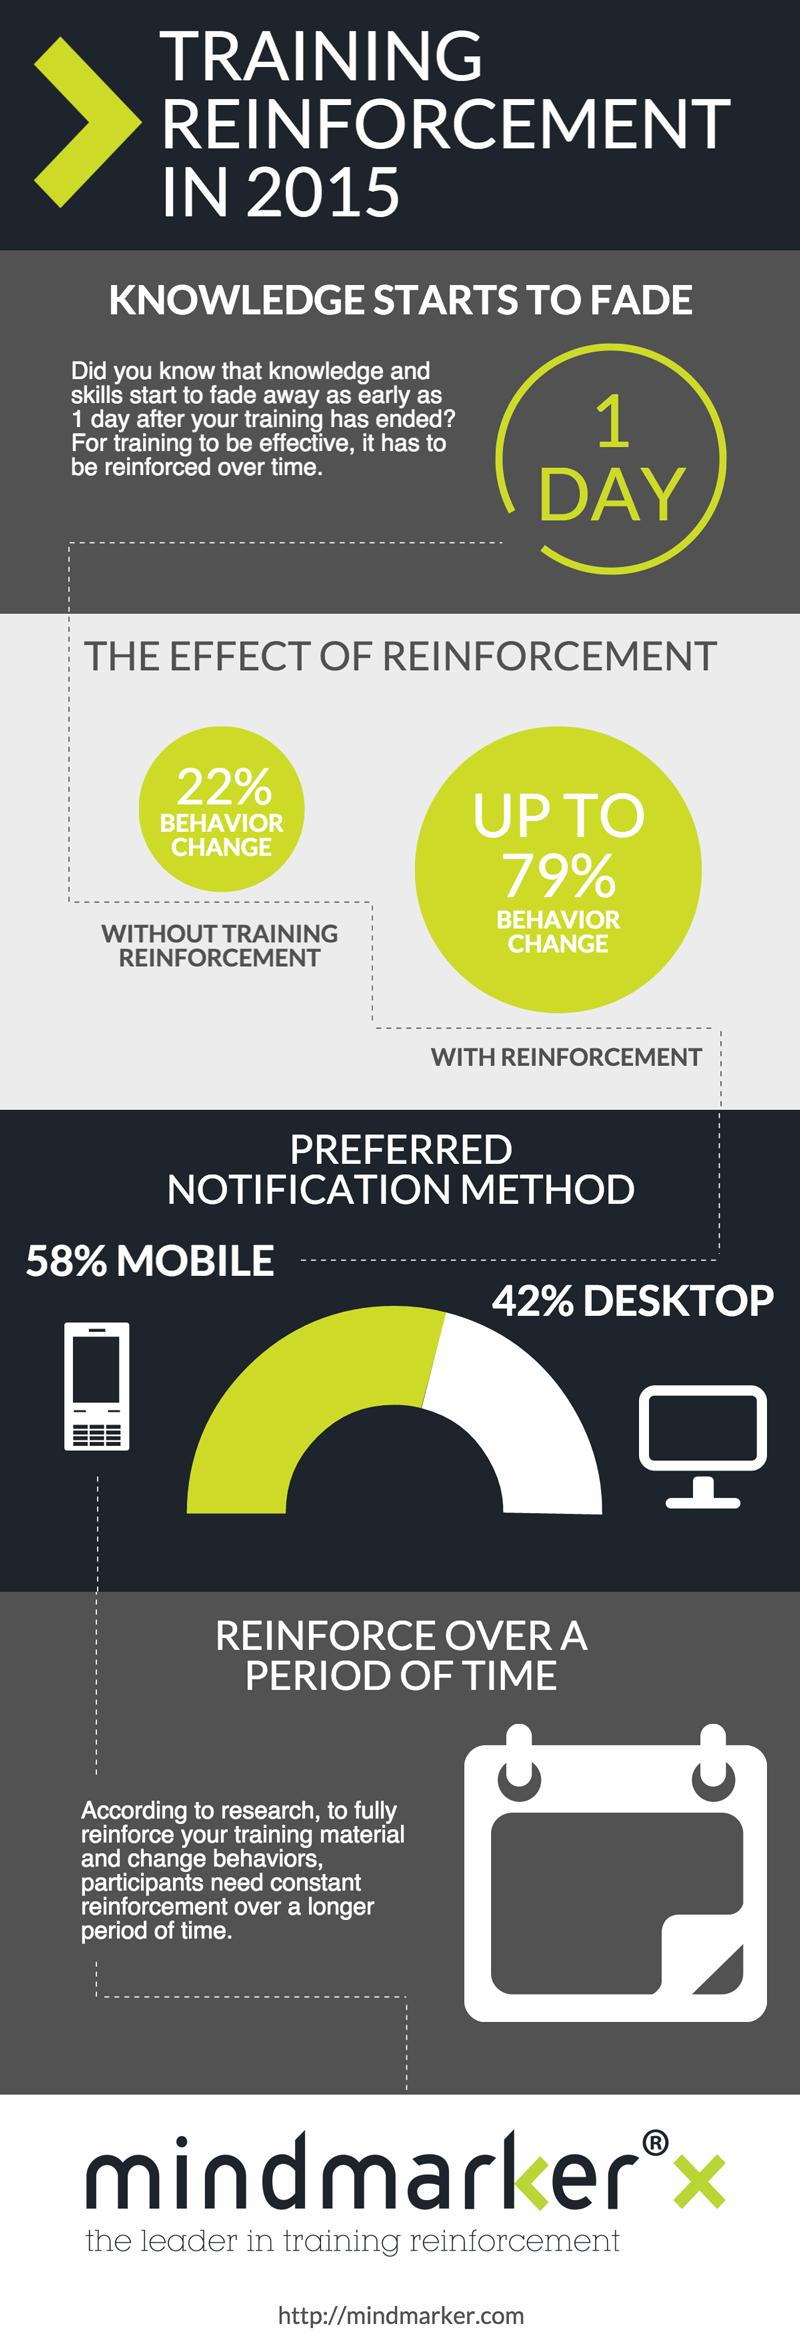 Training Reinforcement in 2015